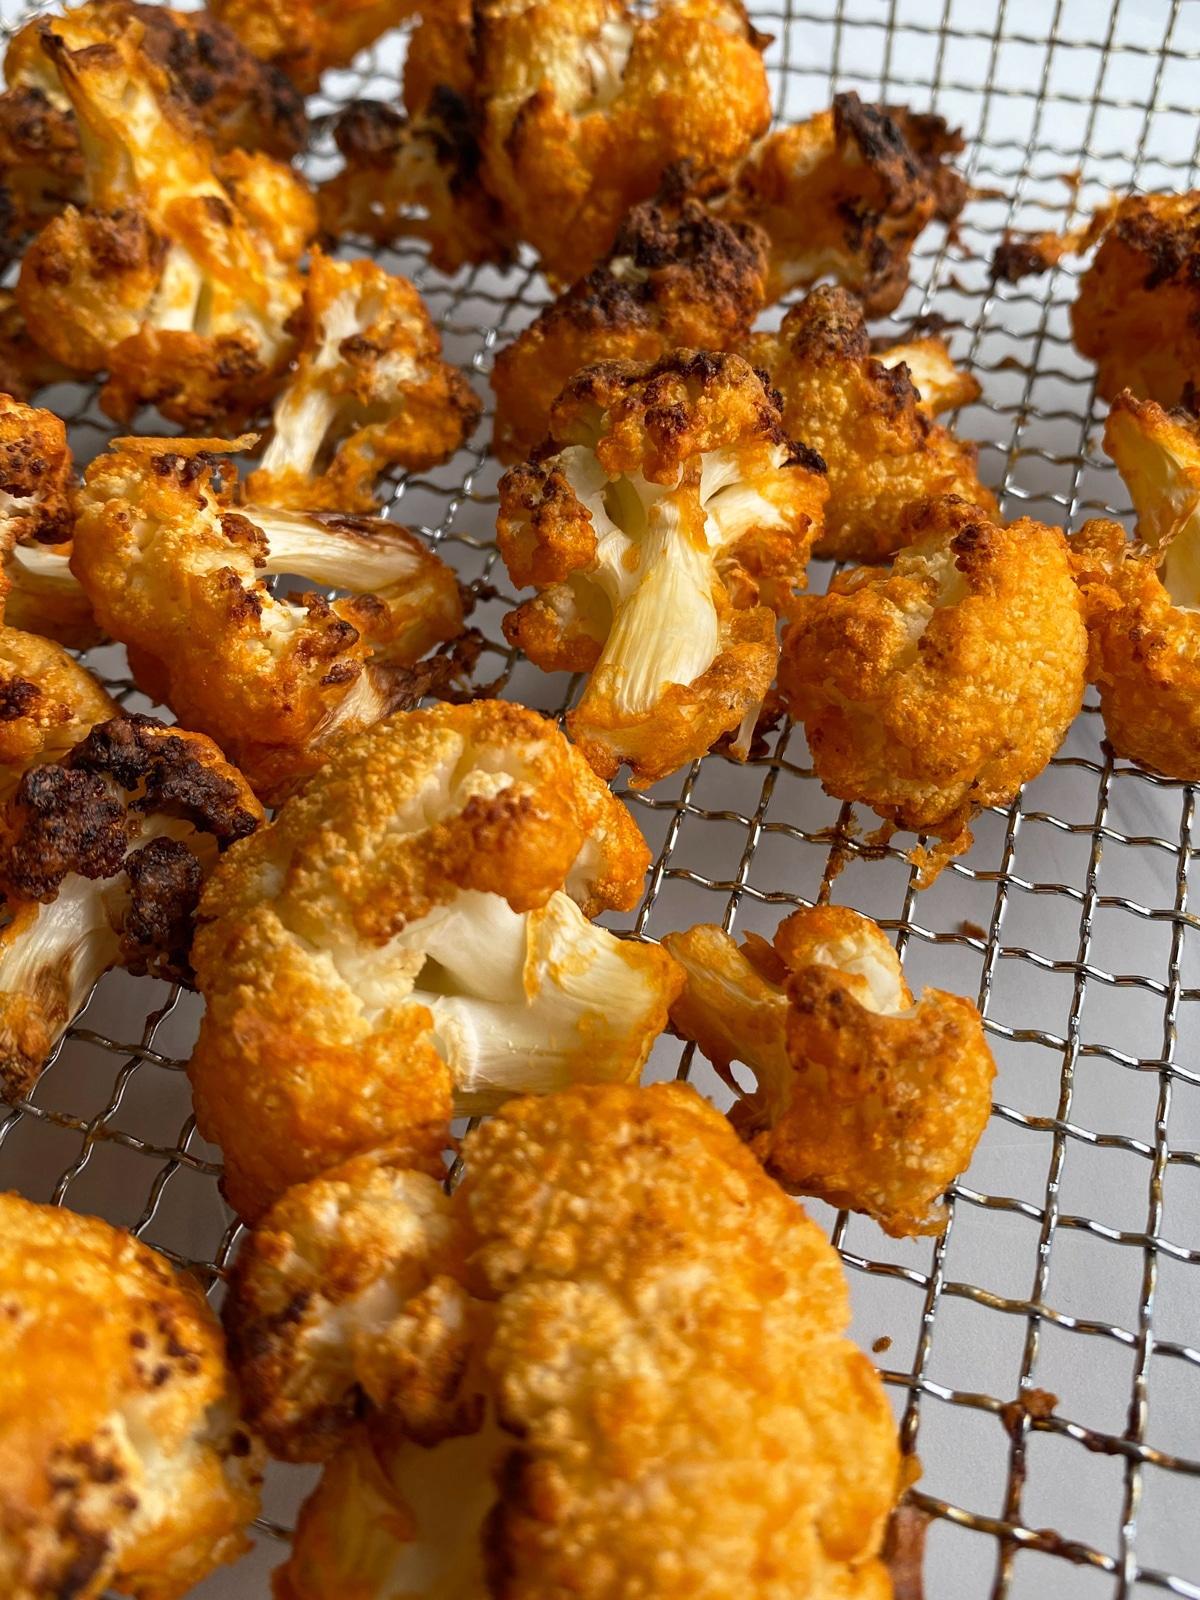 air-fryer-cauliflower-in-frying-basket